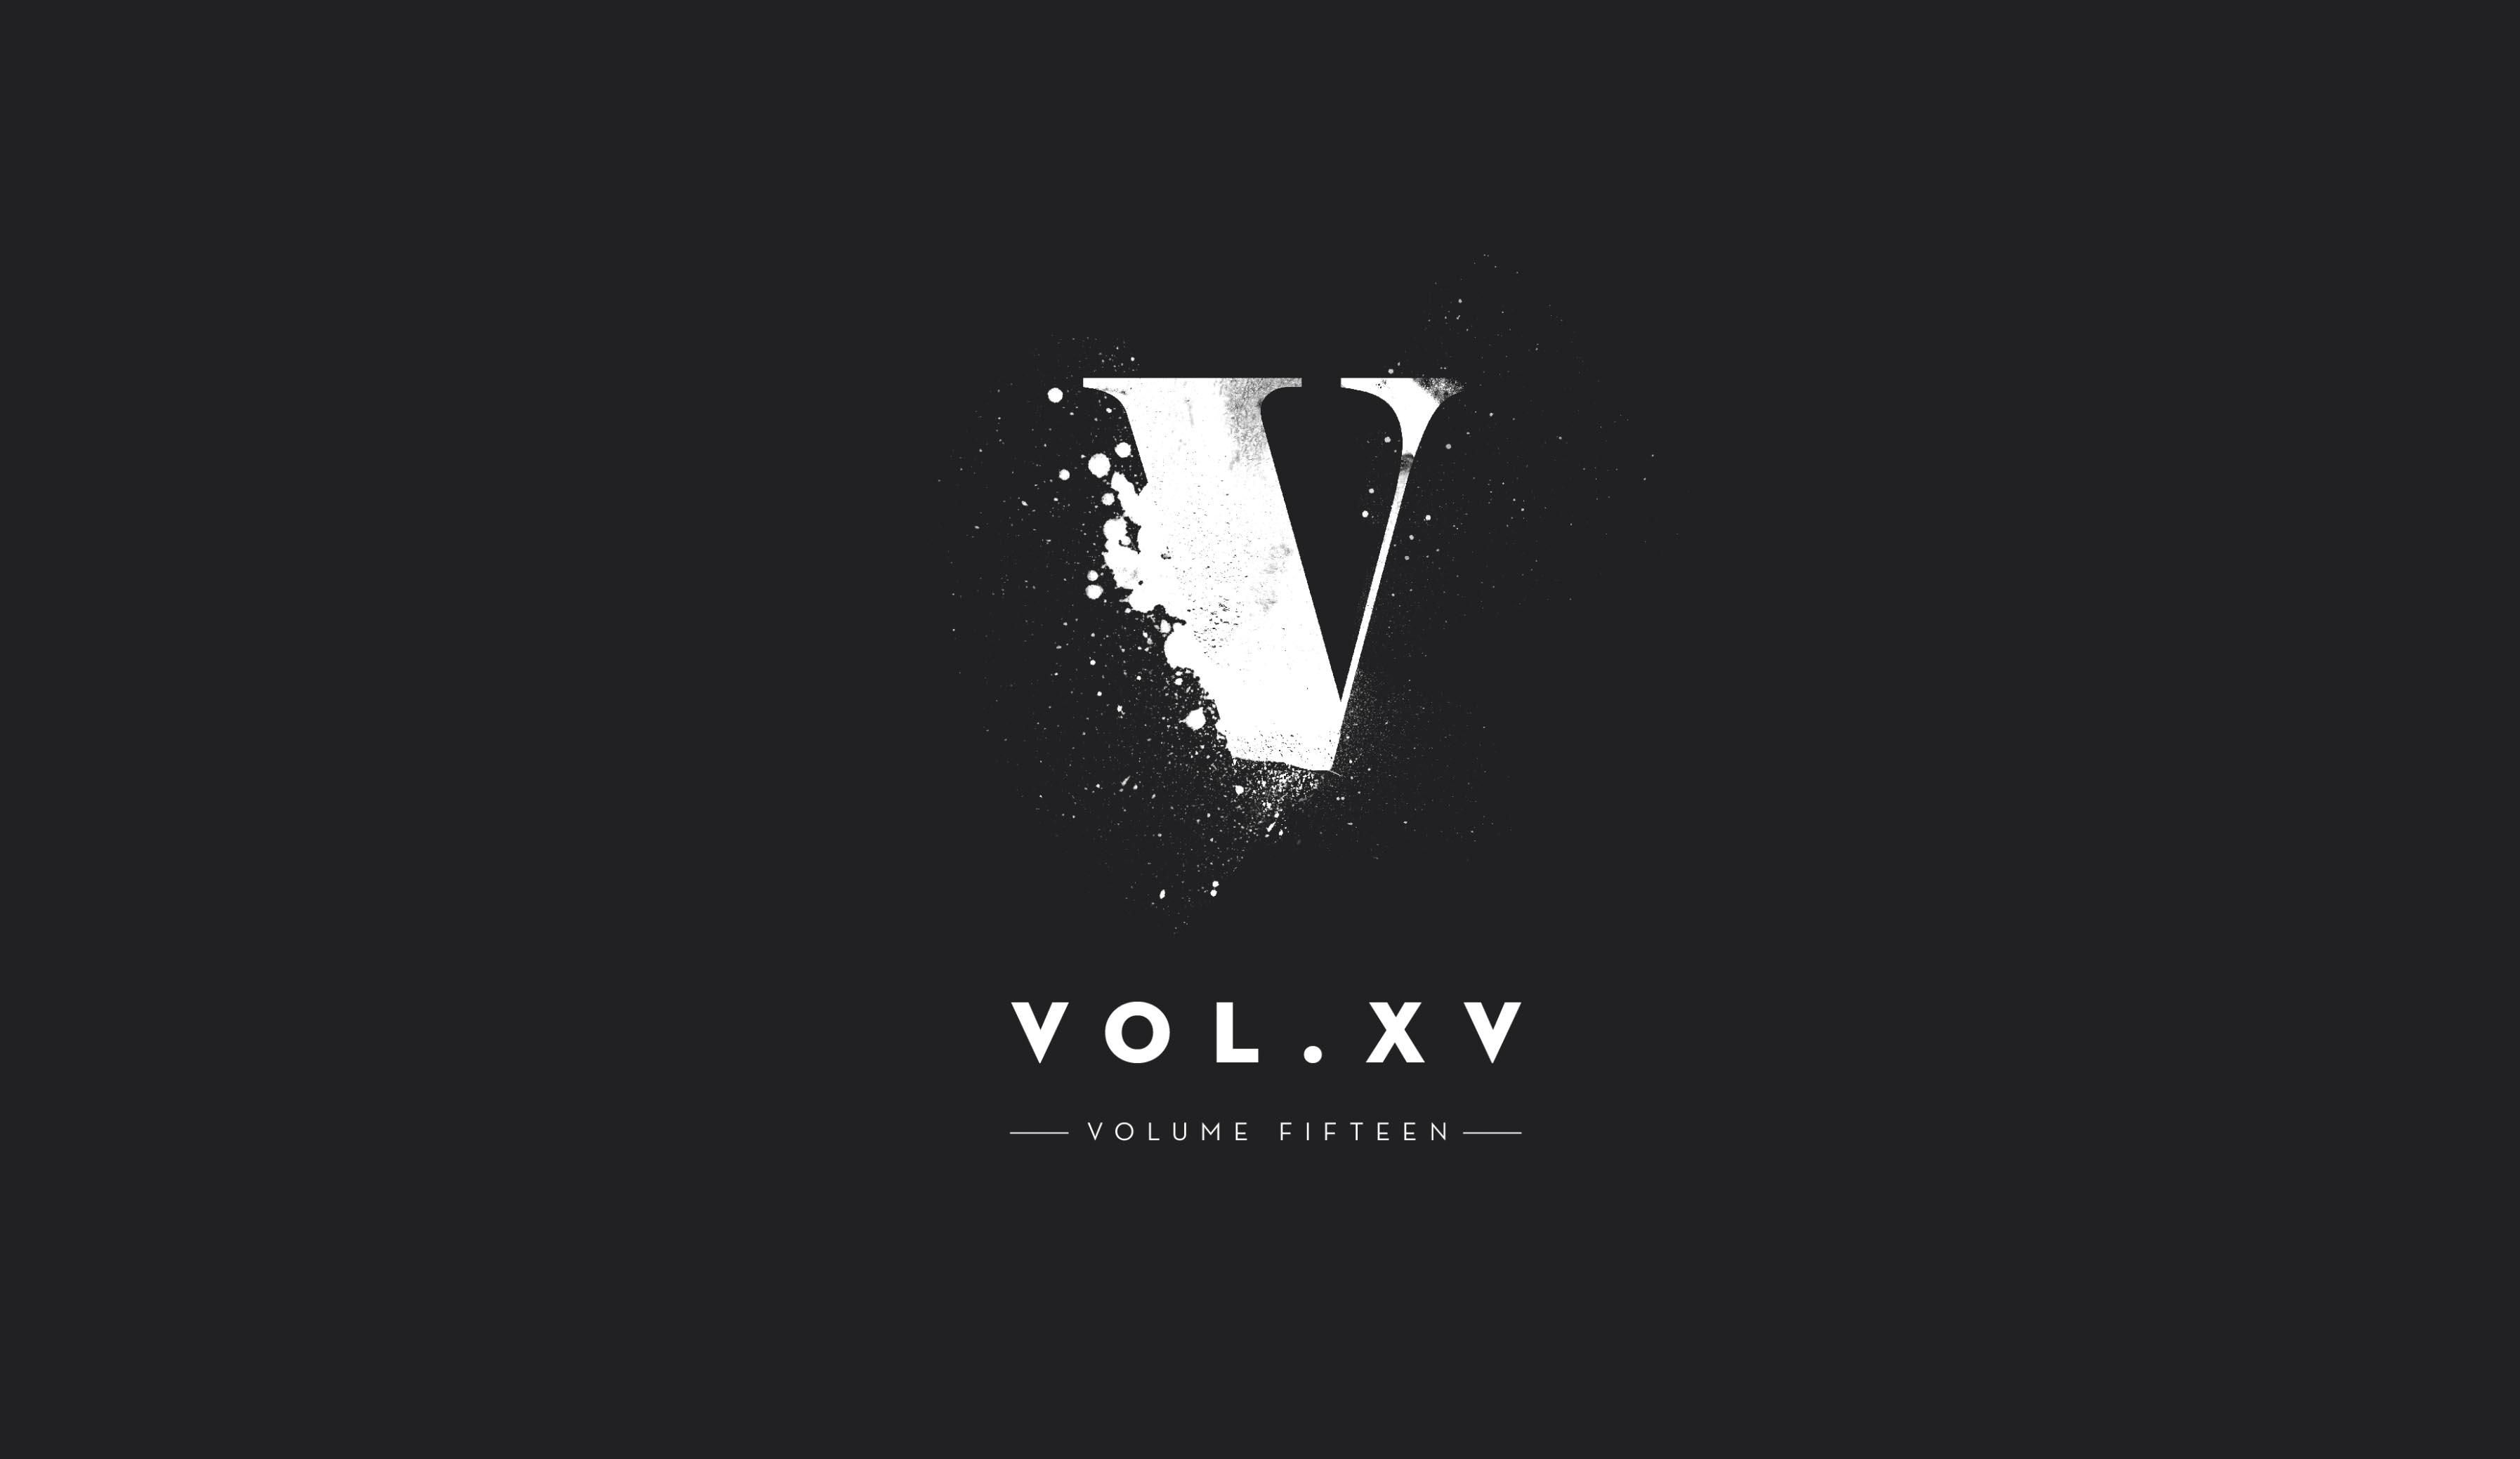 Vol XV logo design